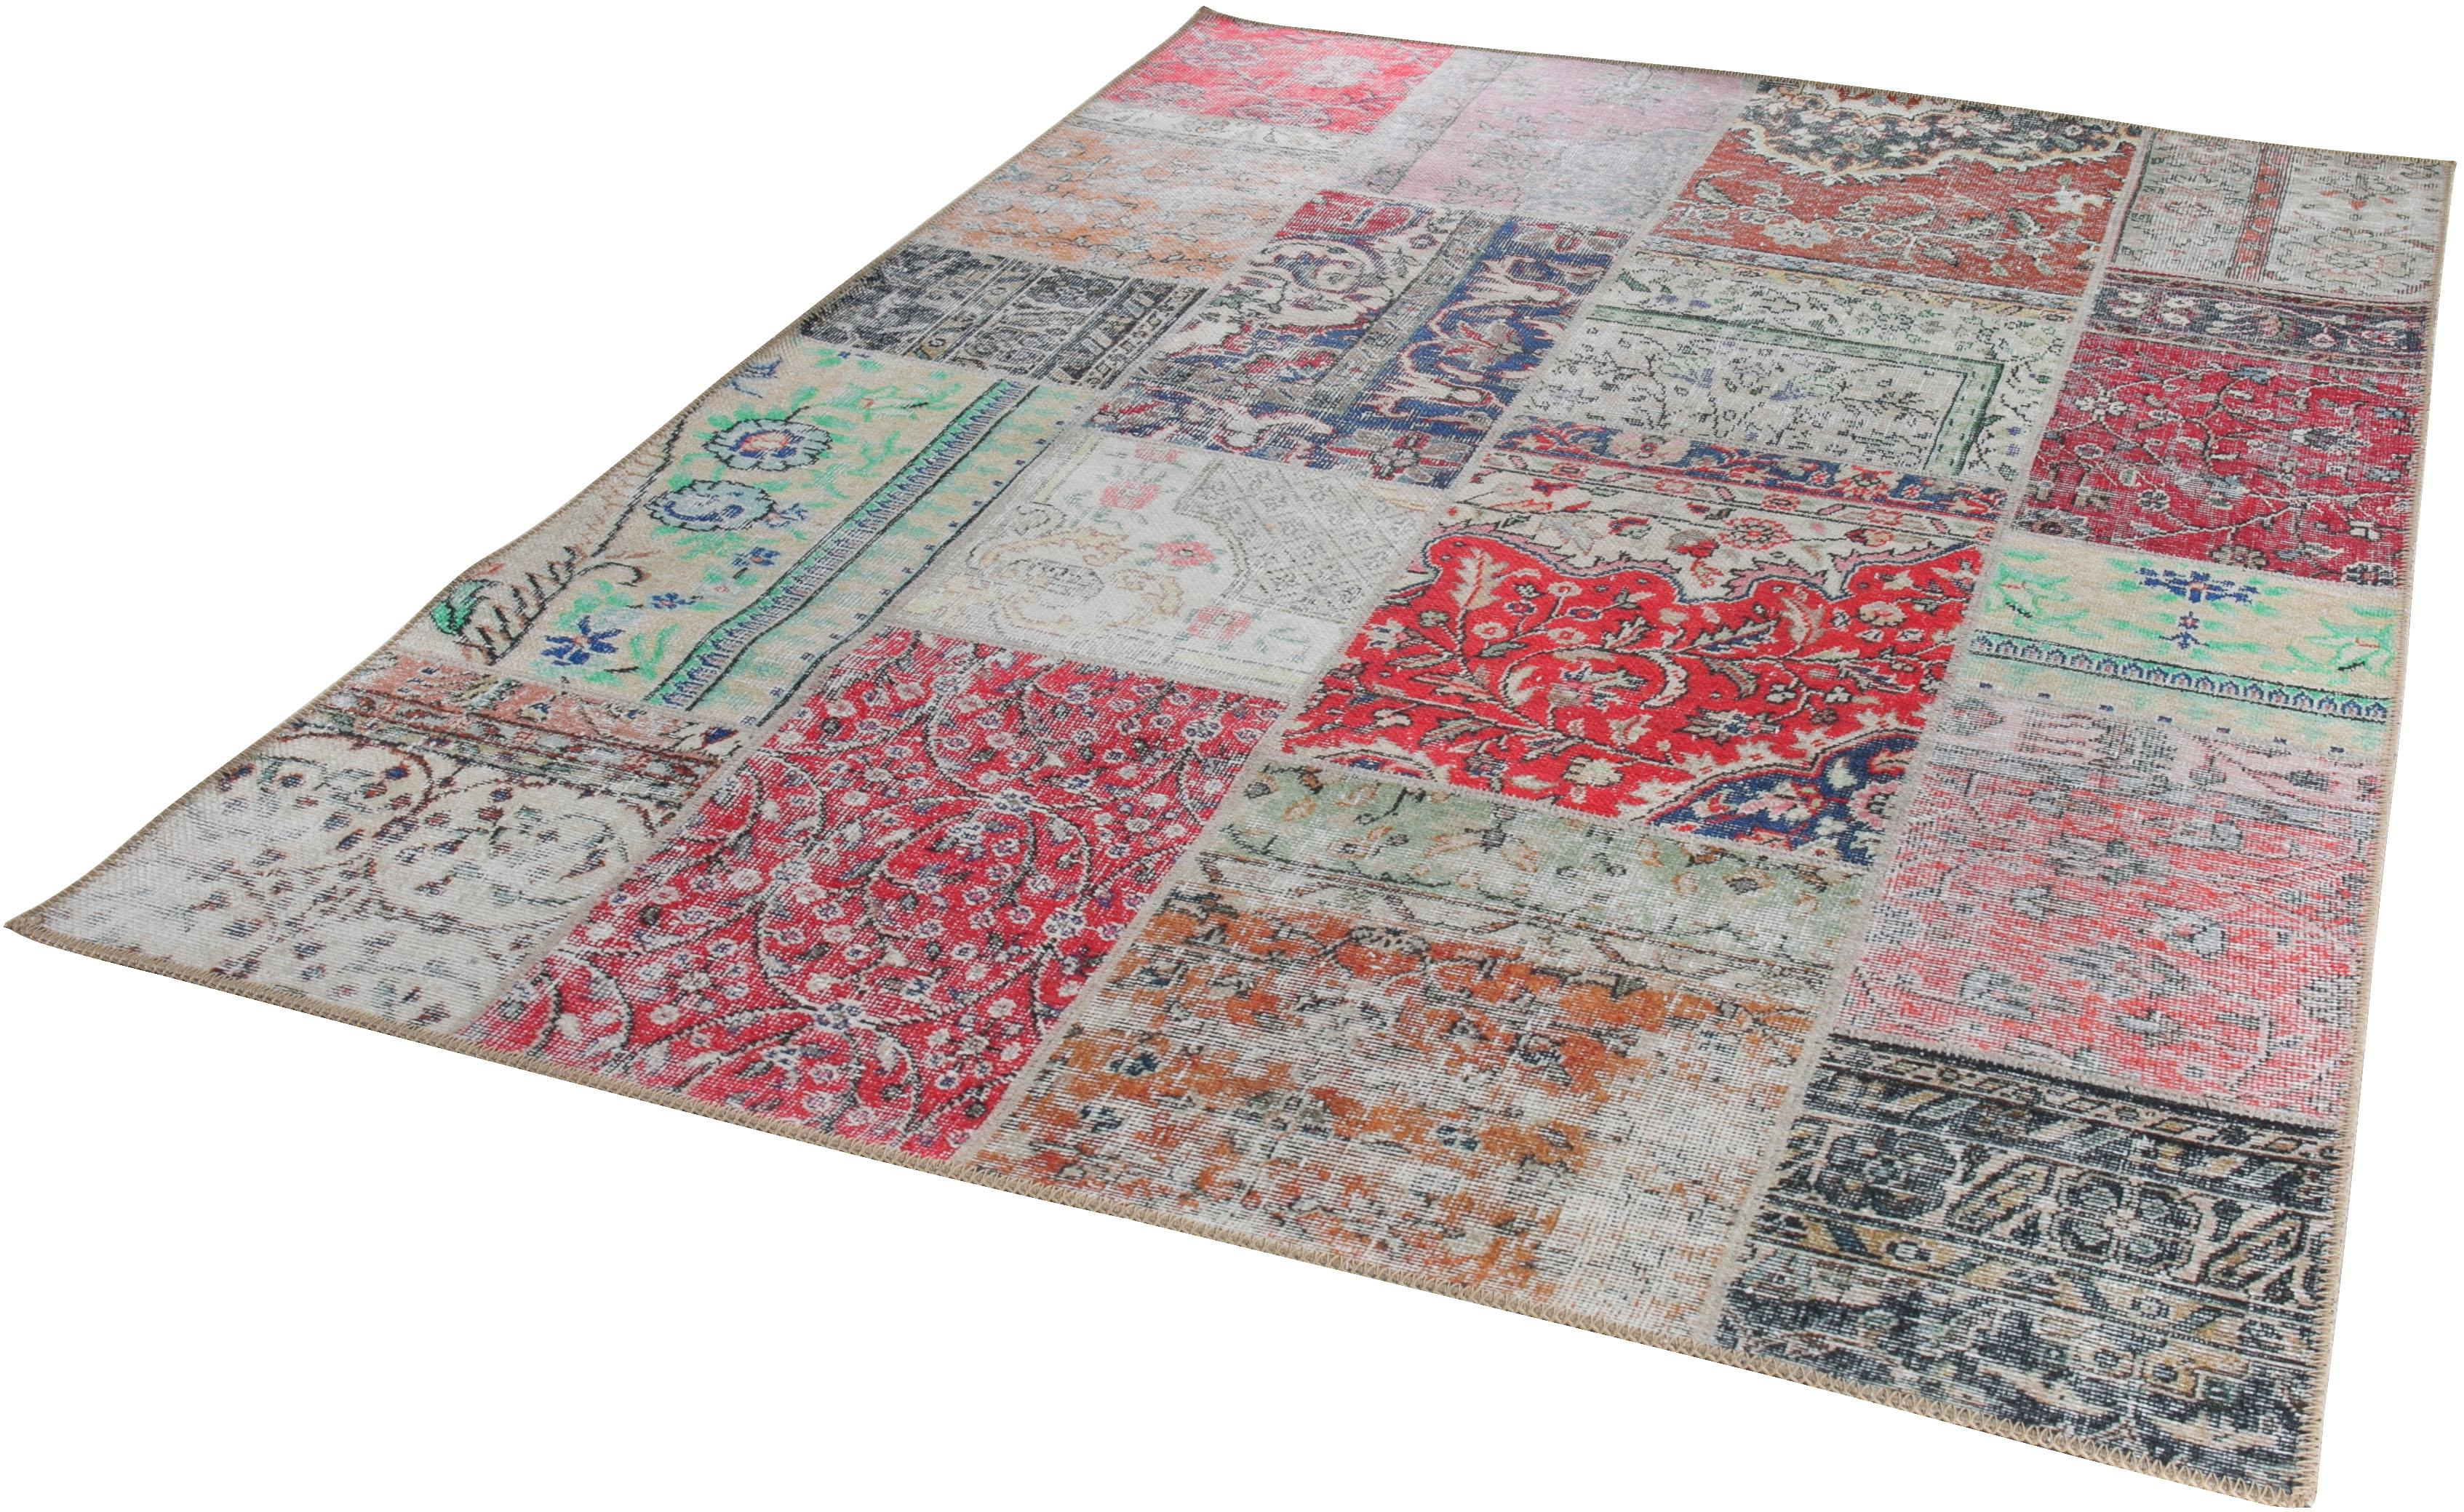 Teppich Essenza LUXOR living rechteckig Höhe 4 mm handgewebt